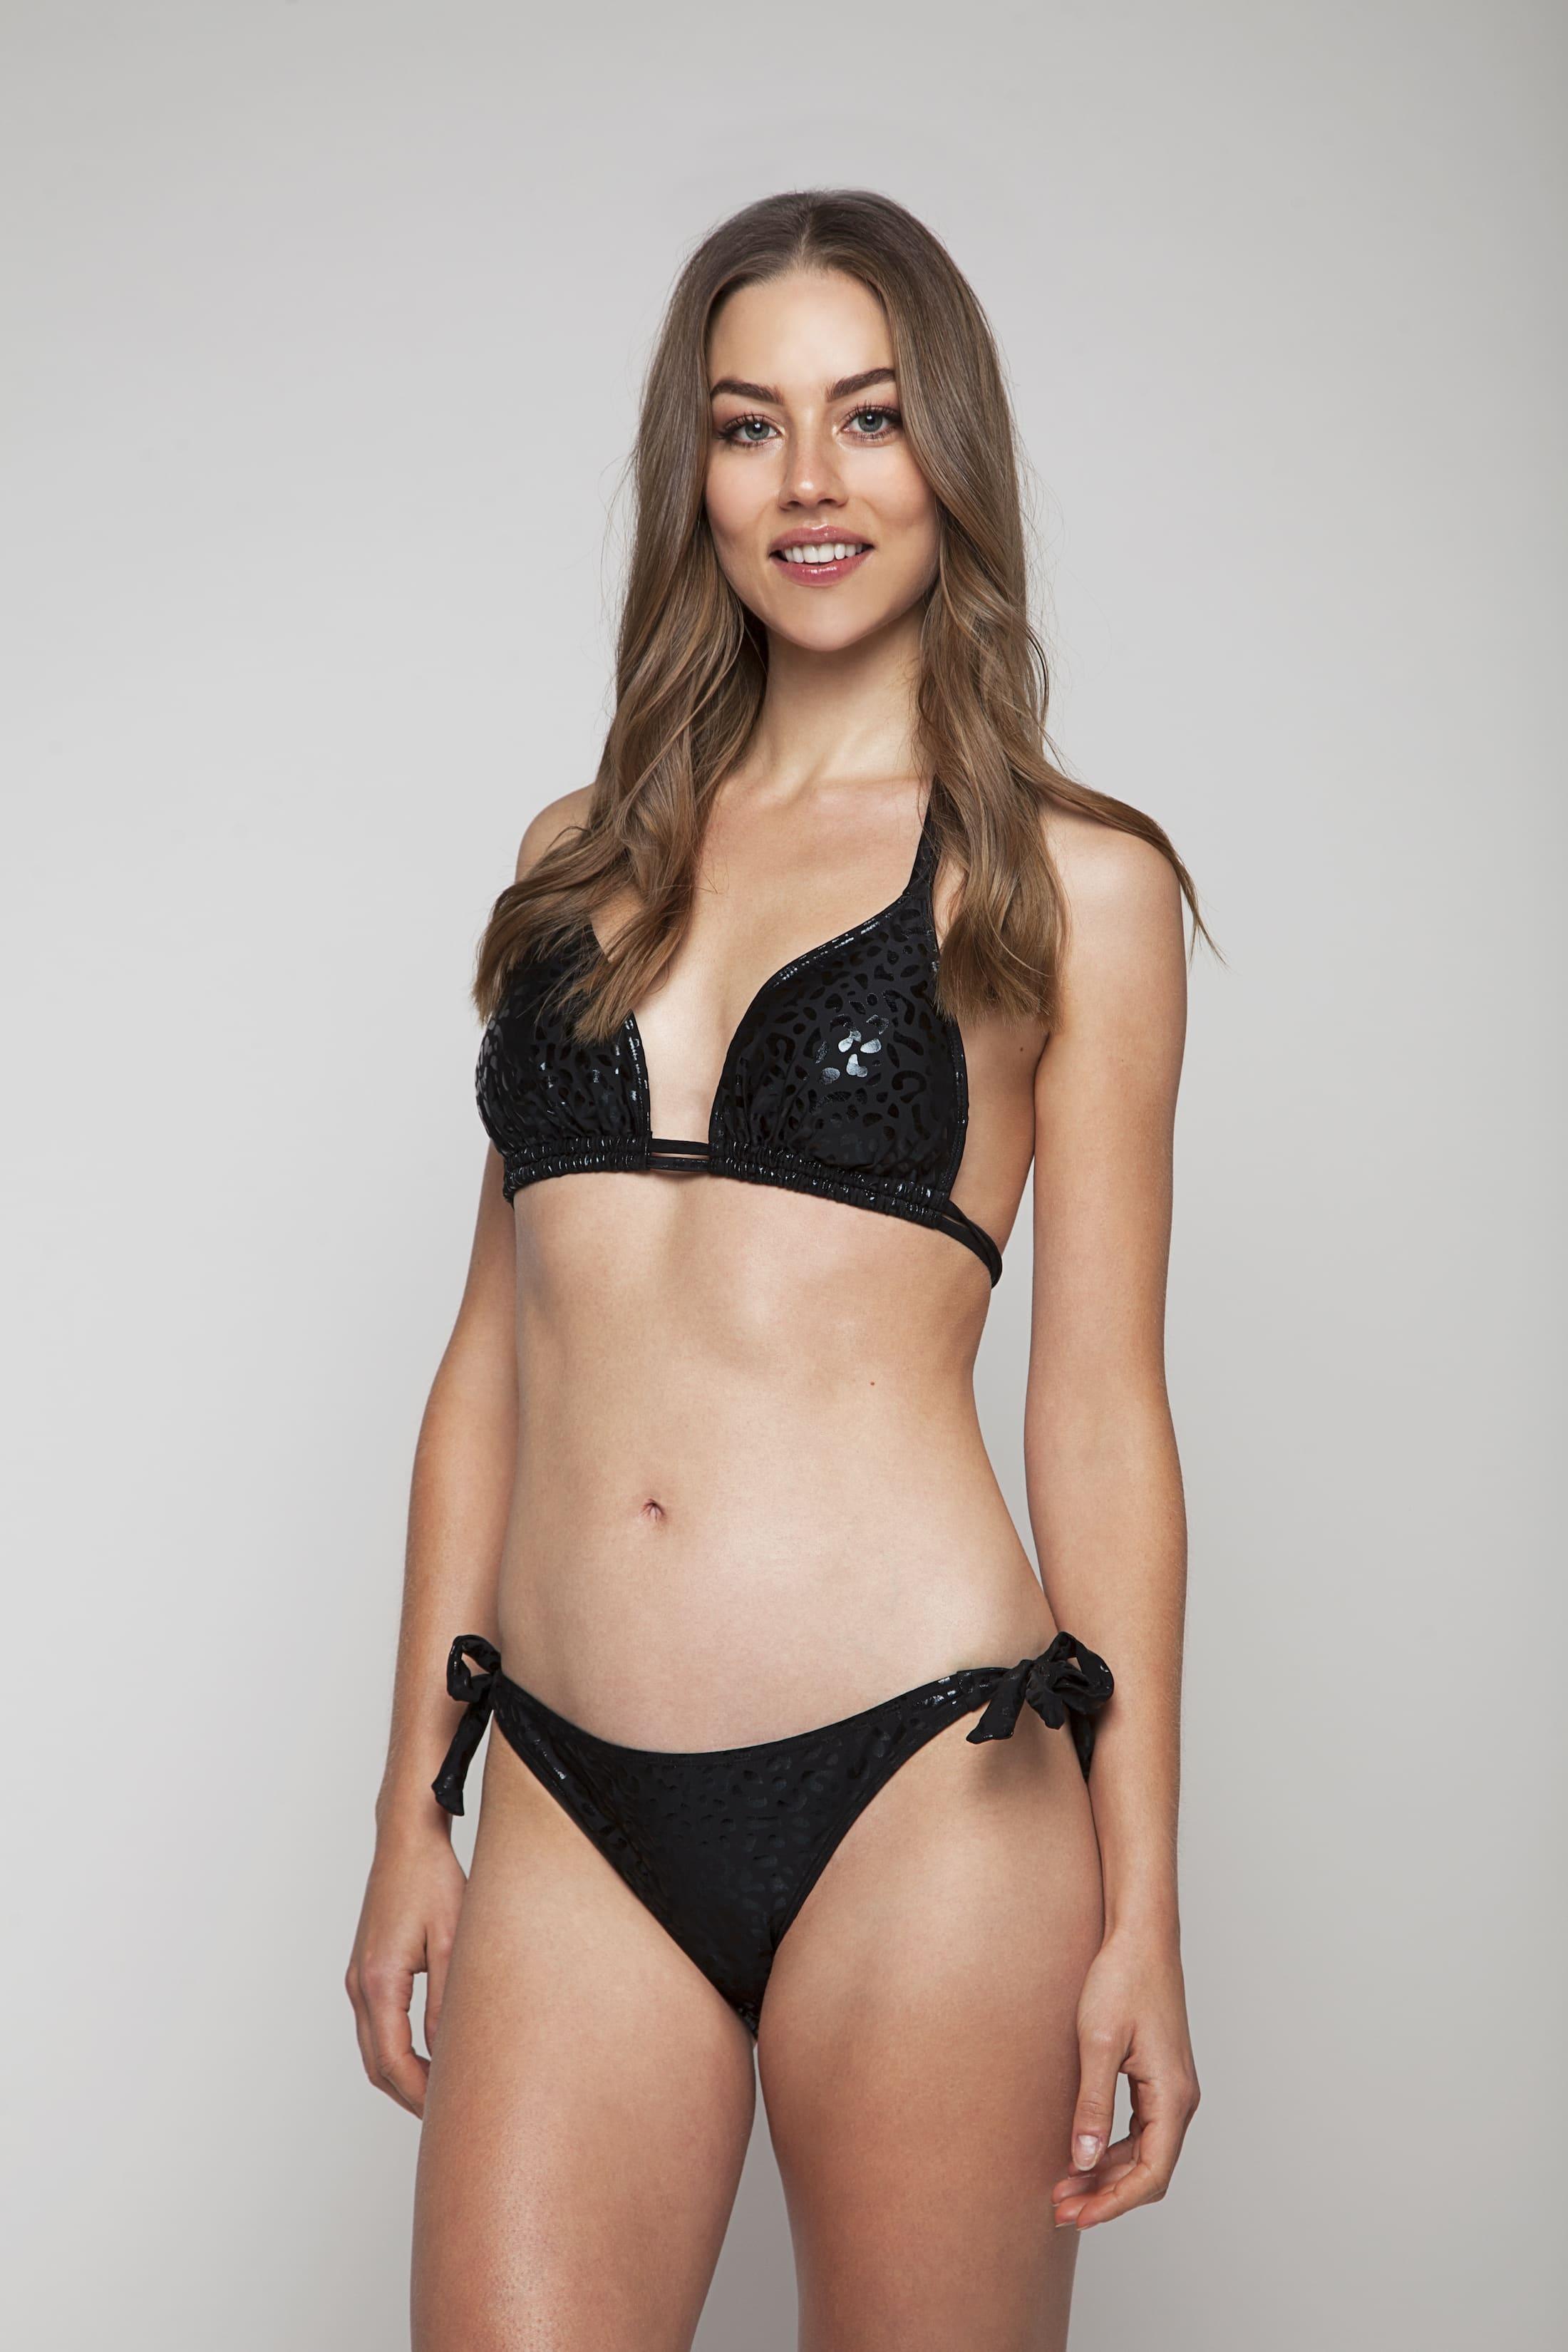 Black bikini top with structure